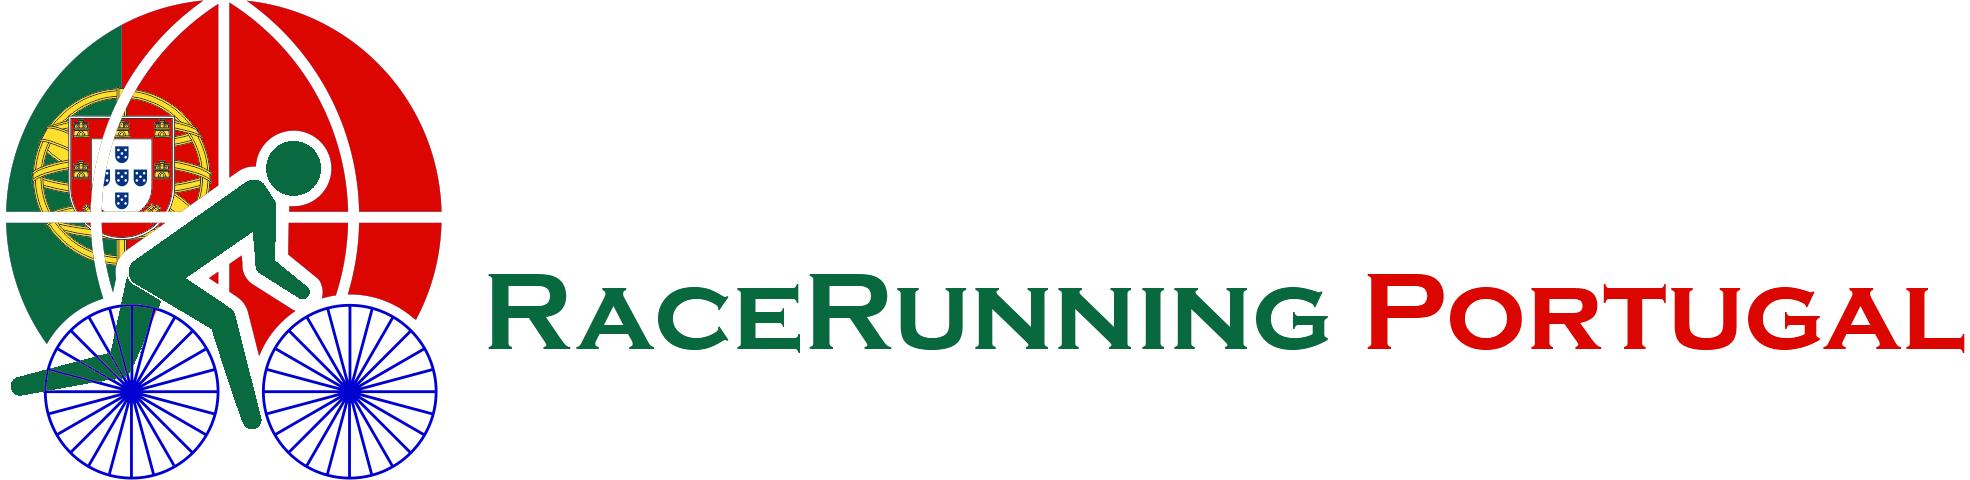 raceruning